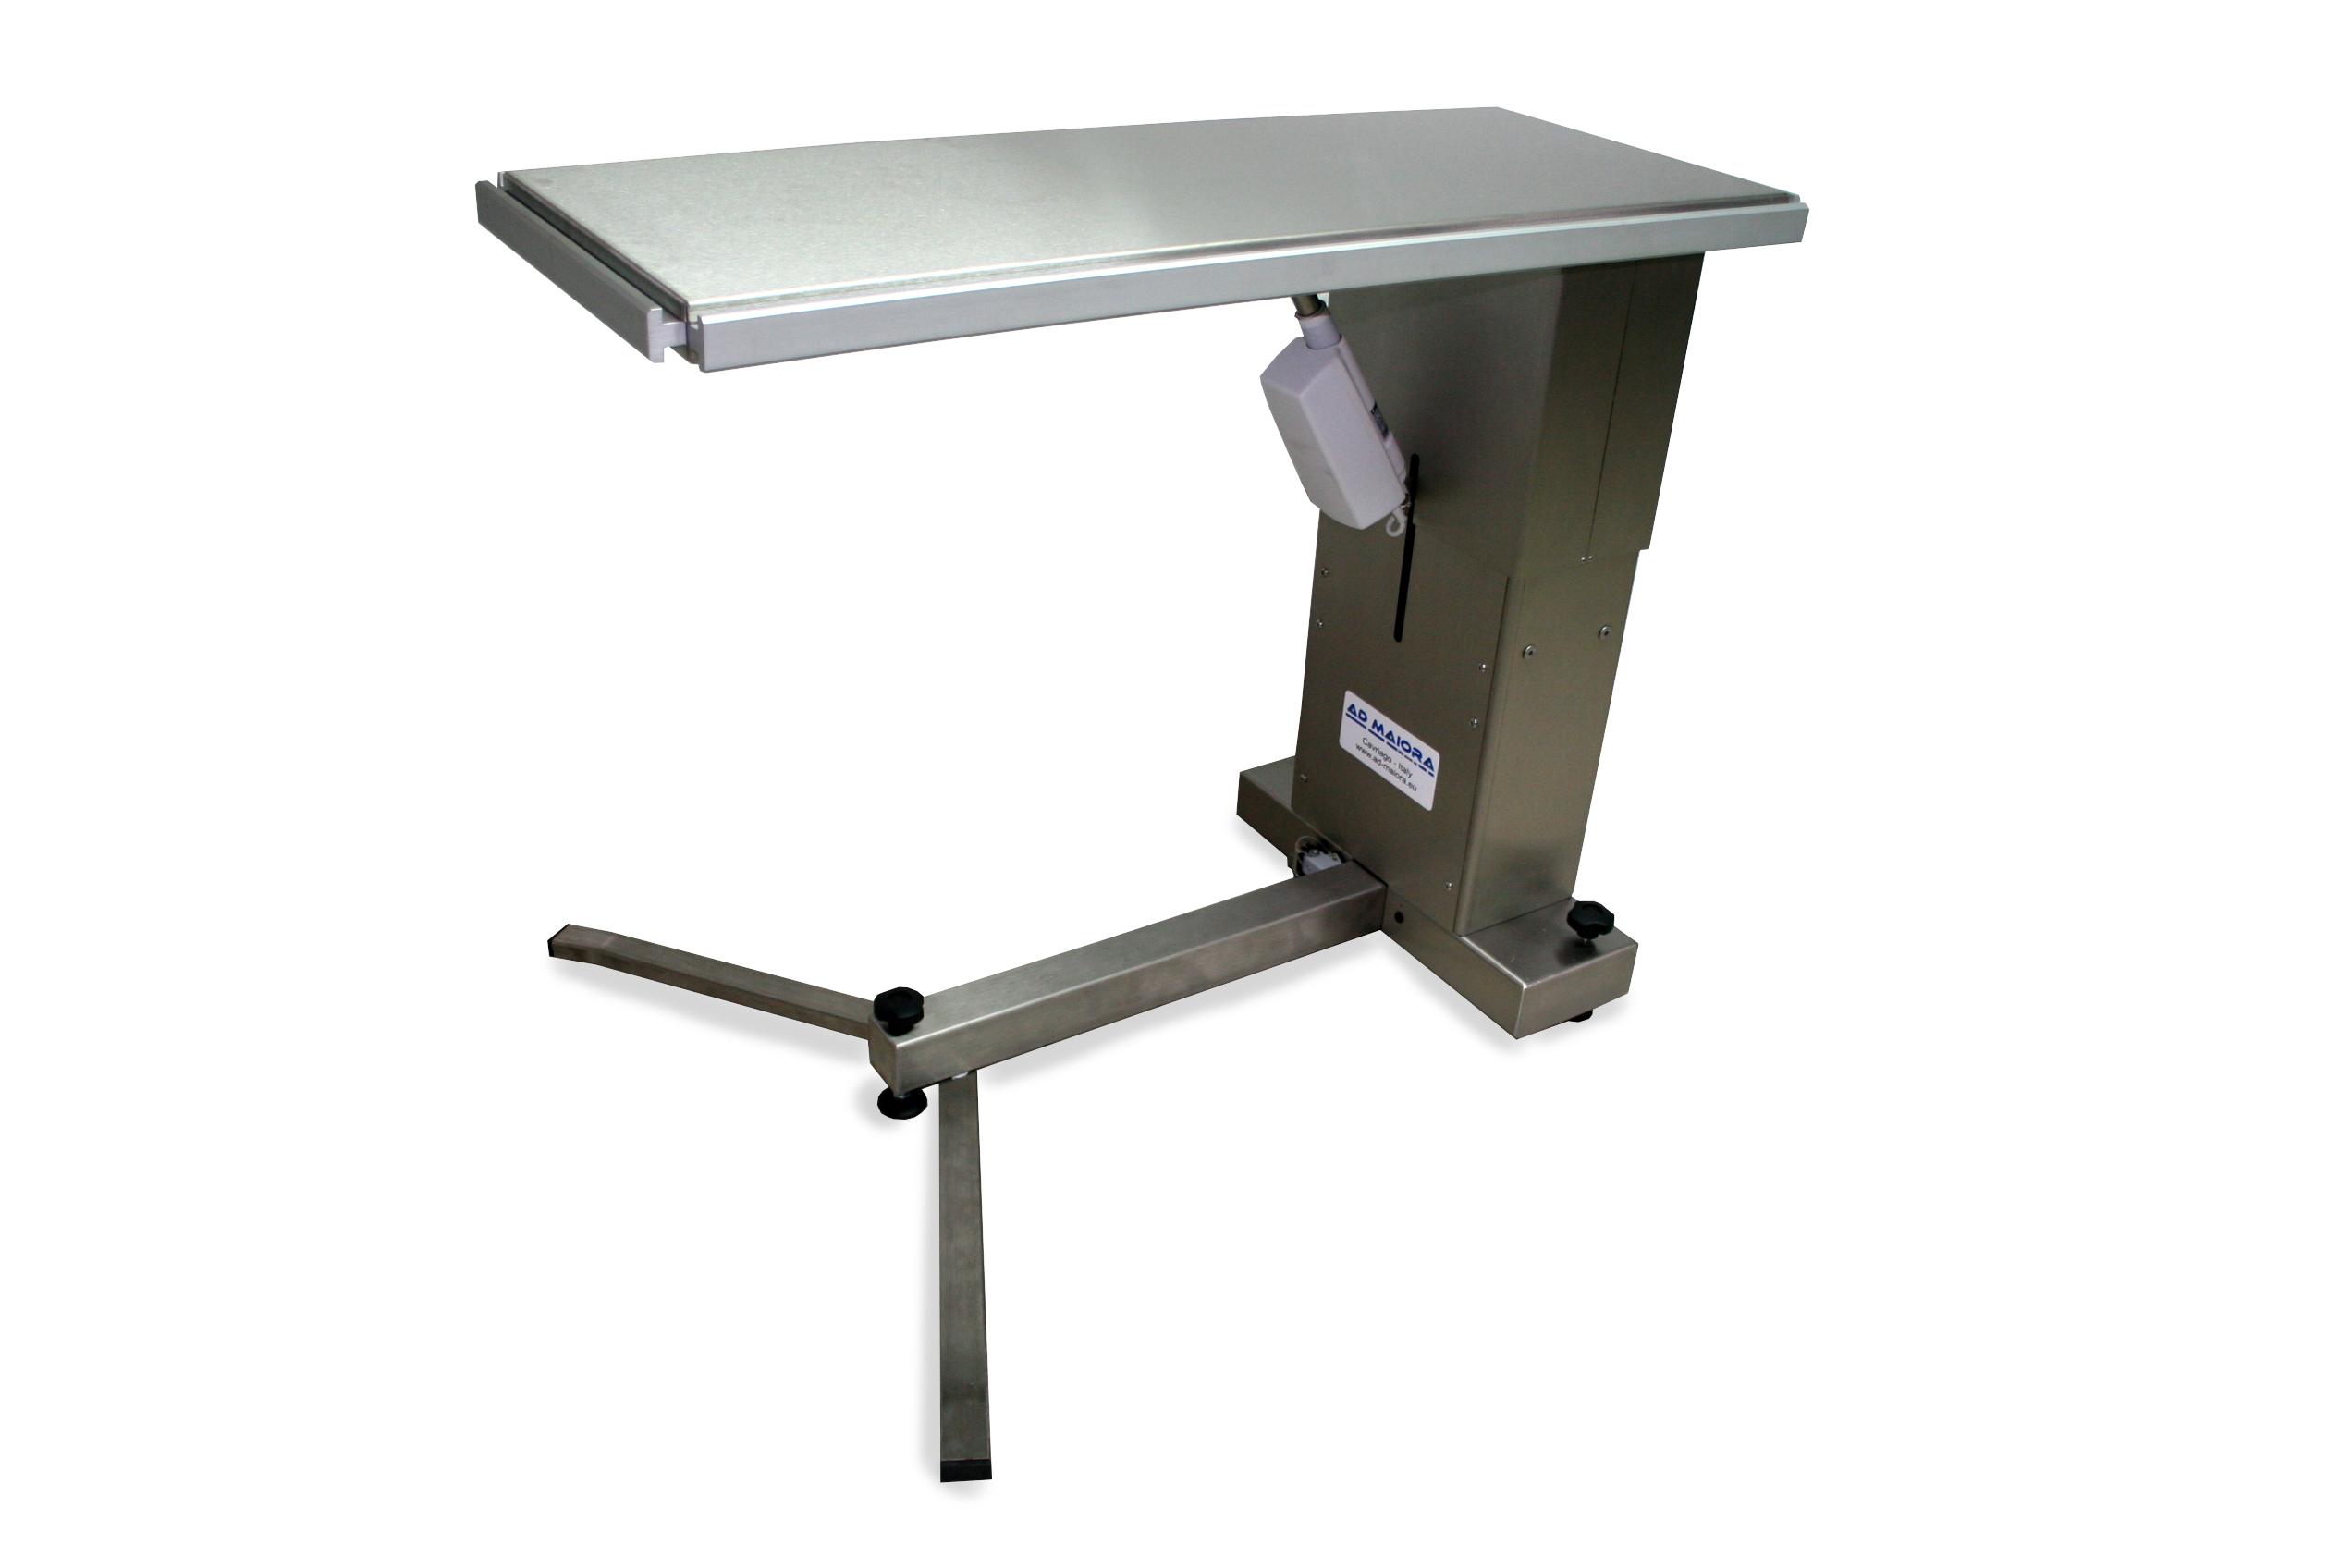 Piano inox per tavolo Ergomed Stainless steel table top Encima inox para mesa